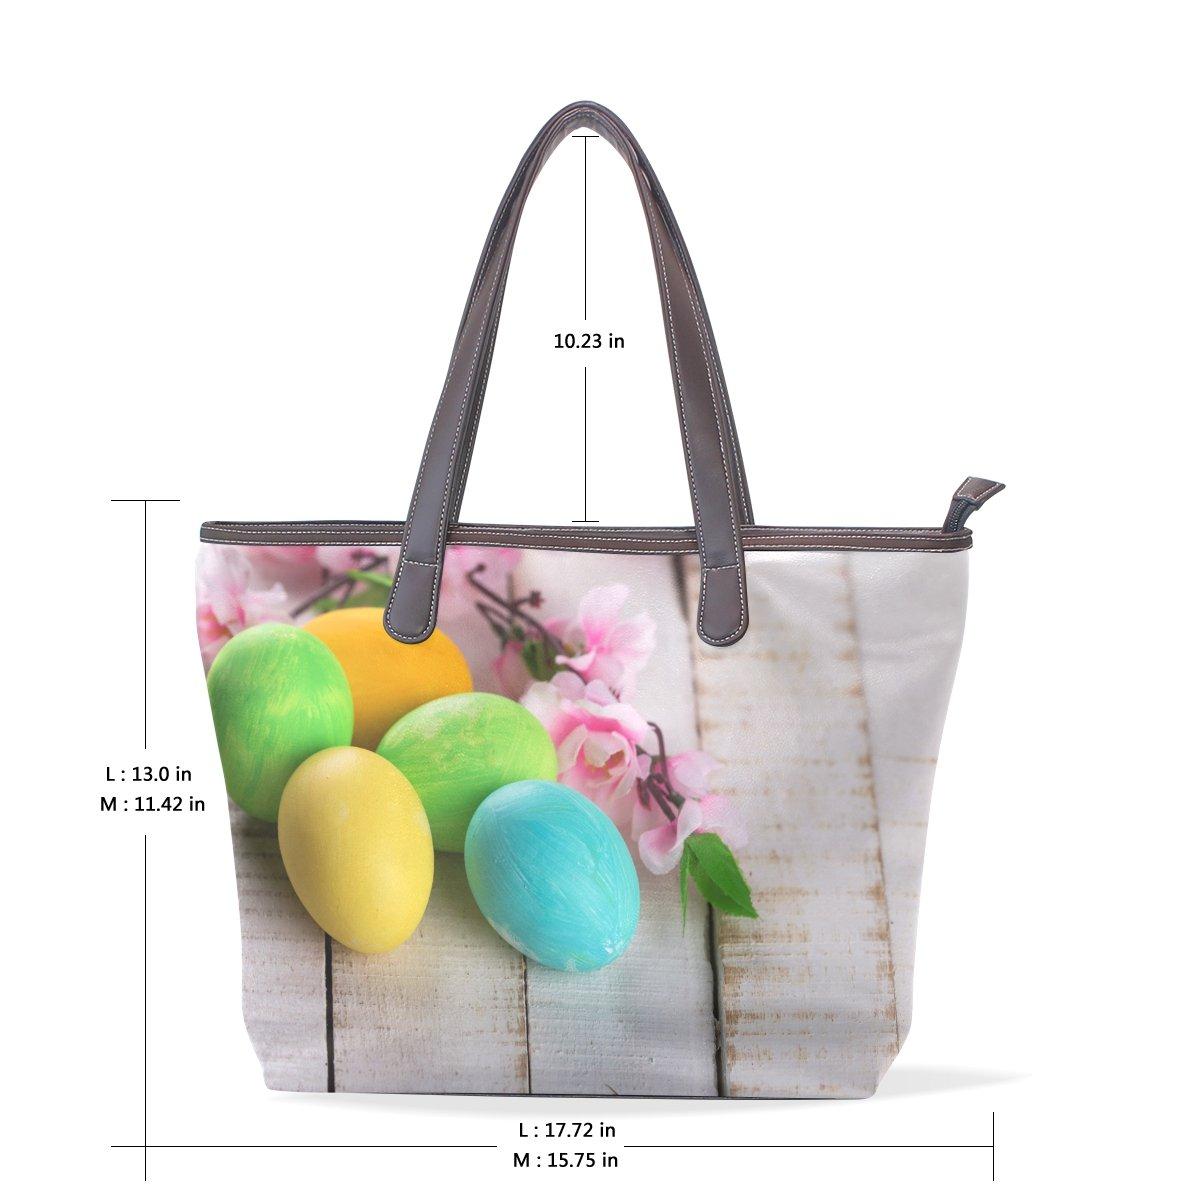 Ye Store Easter Eggs Lady PU Leather Handbag Tote Bag Shoulder Bag Shopping Bag